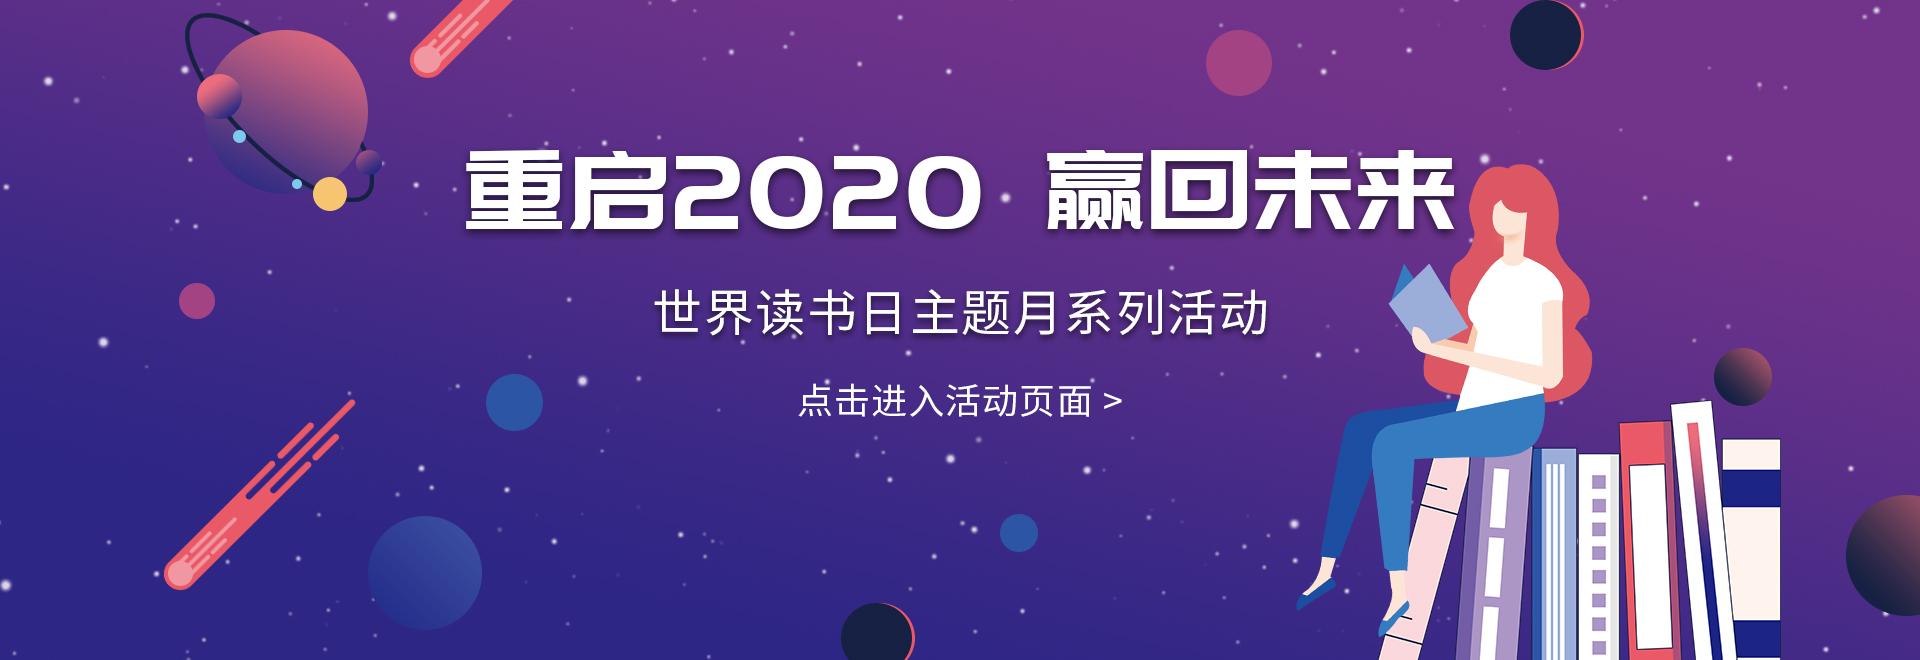 2020.4.23